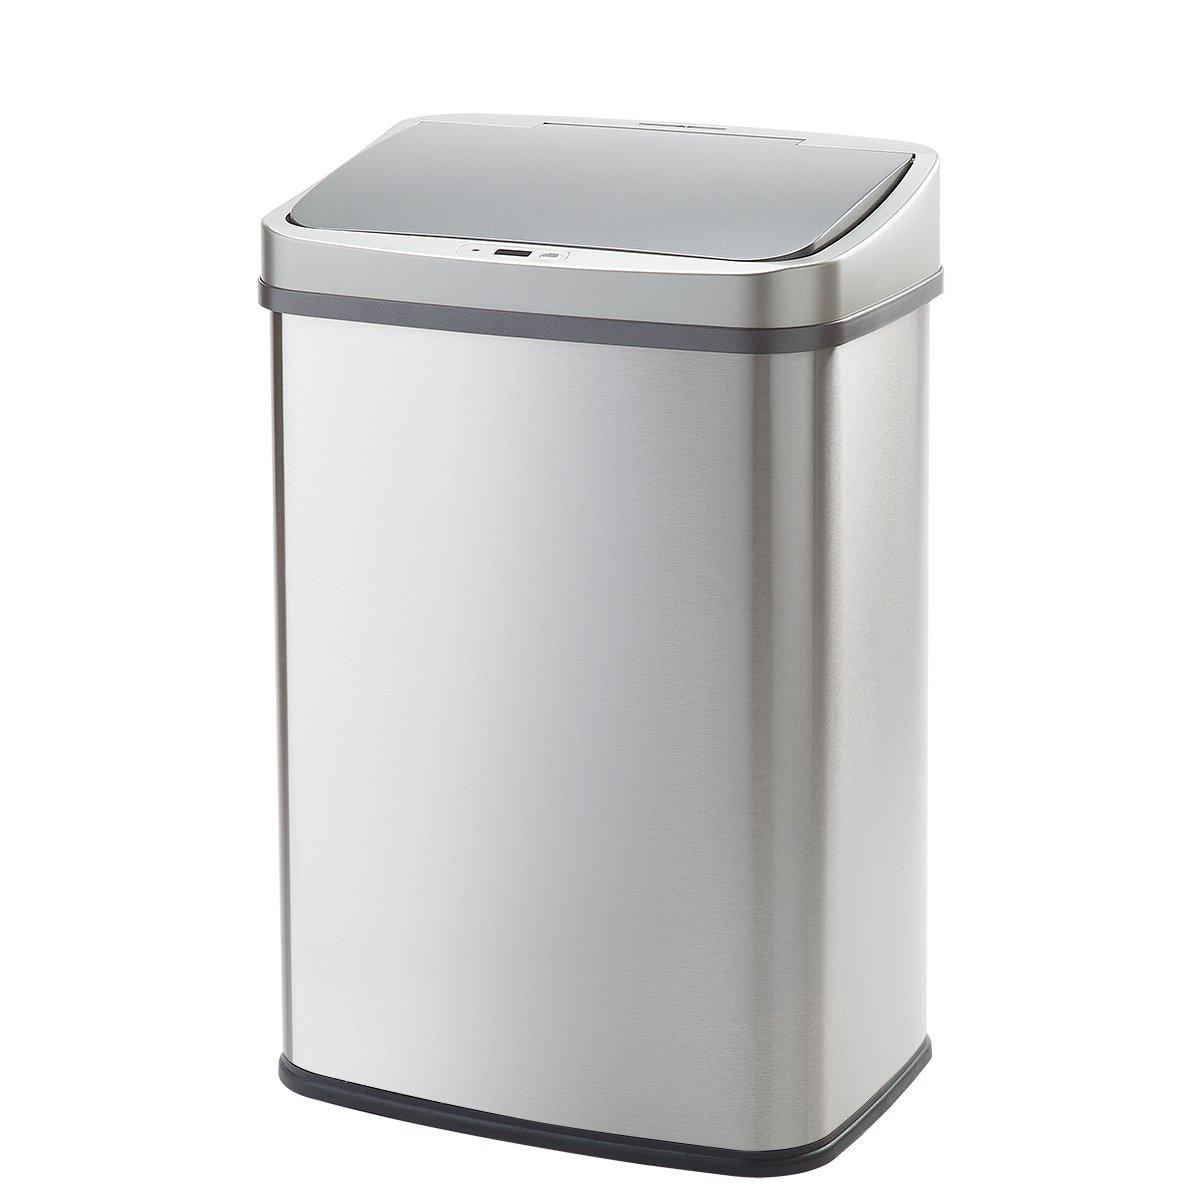 WY LIVING S 自動センサー式ゴミ箱 50リットル 分類シール付 ステンレス製 ふた付き 電池式 WY-HM007 B01NCAQSN6 50リットル 50リットル